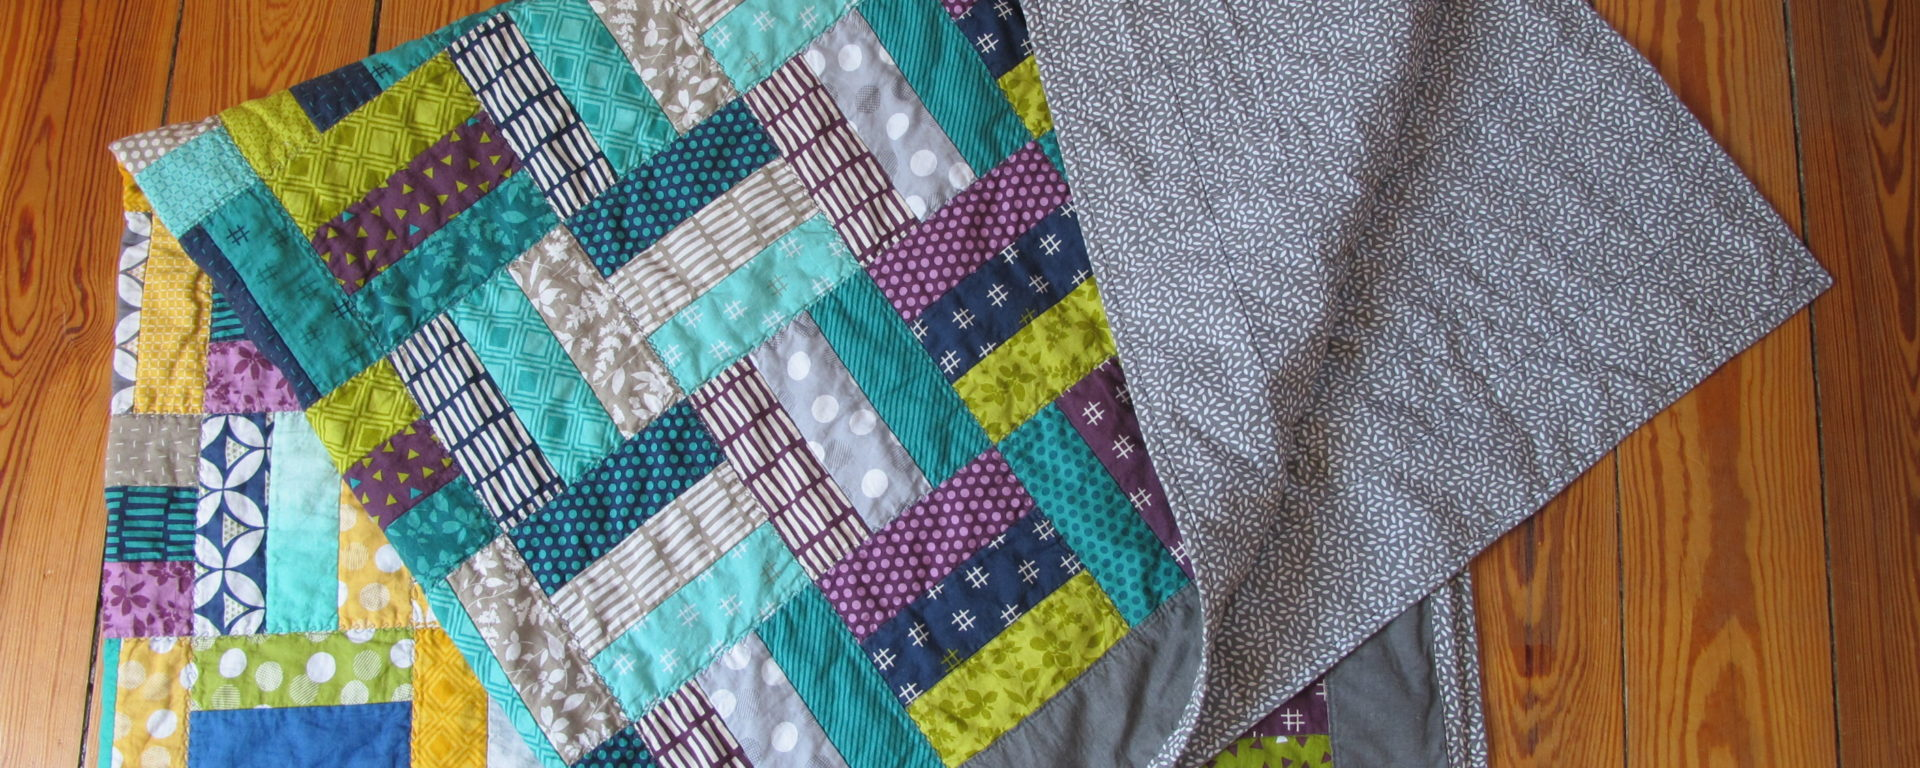 patchworkdecke aus jelly rolls